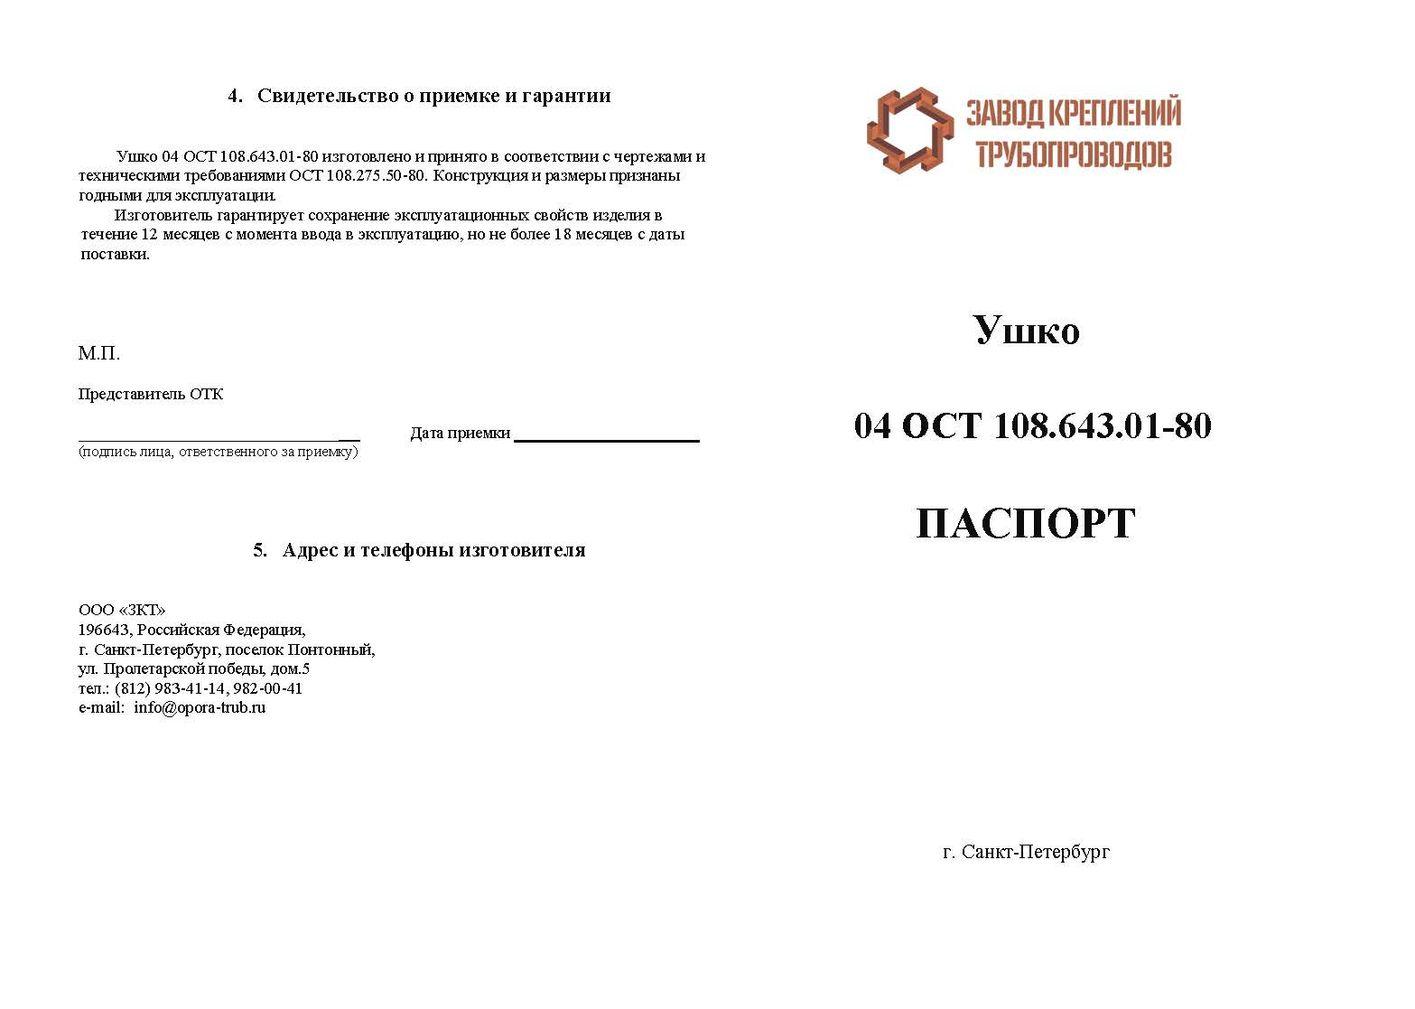 Паспорт ушко 04 ОСТ 108.643.01-80 стр.1